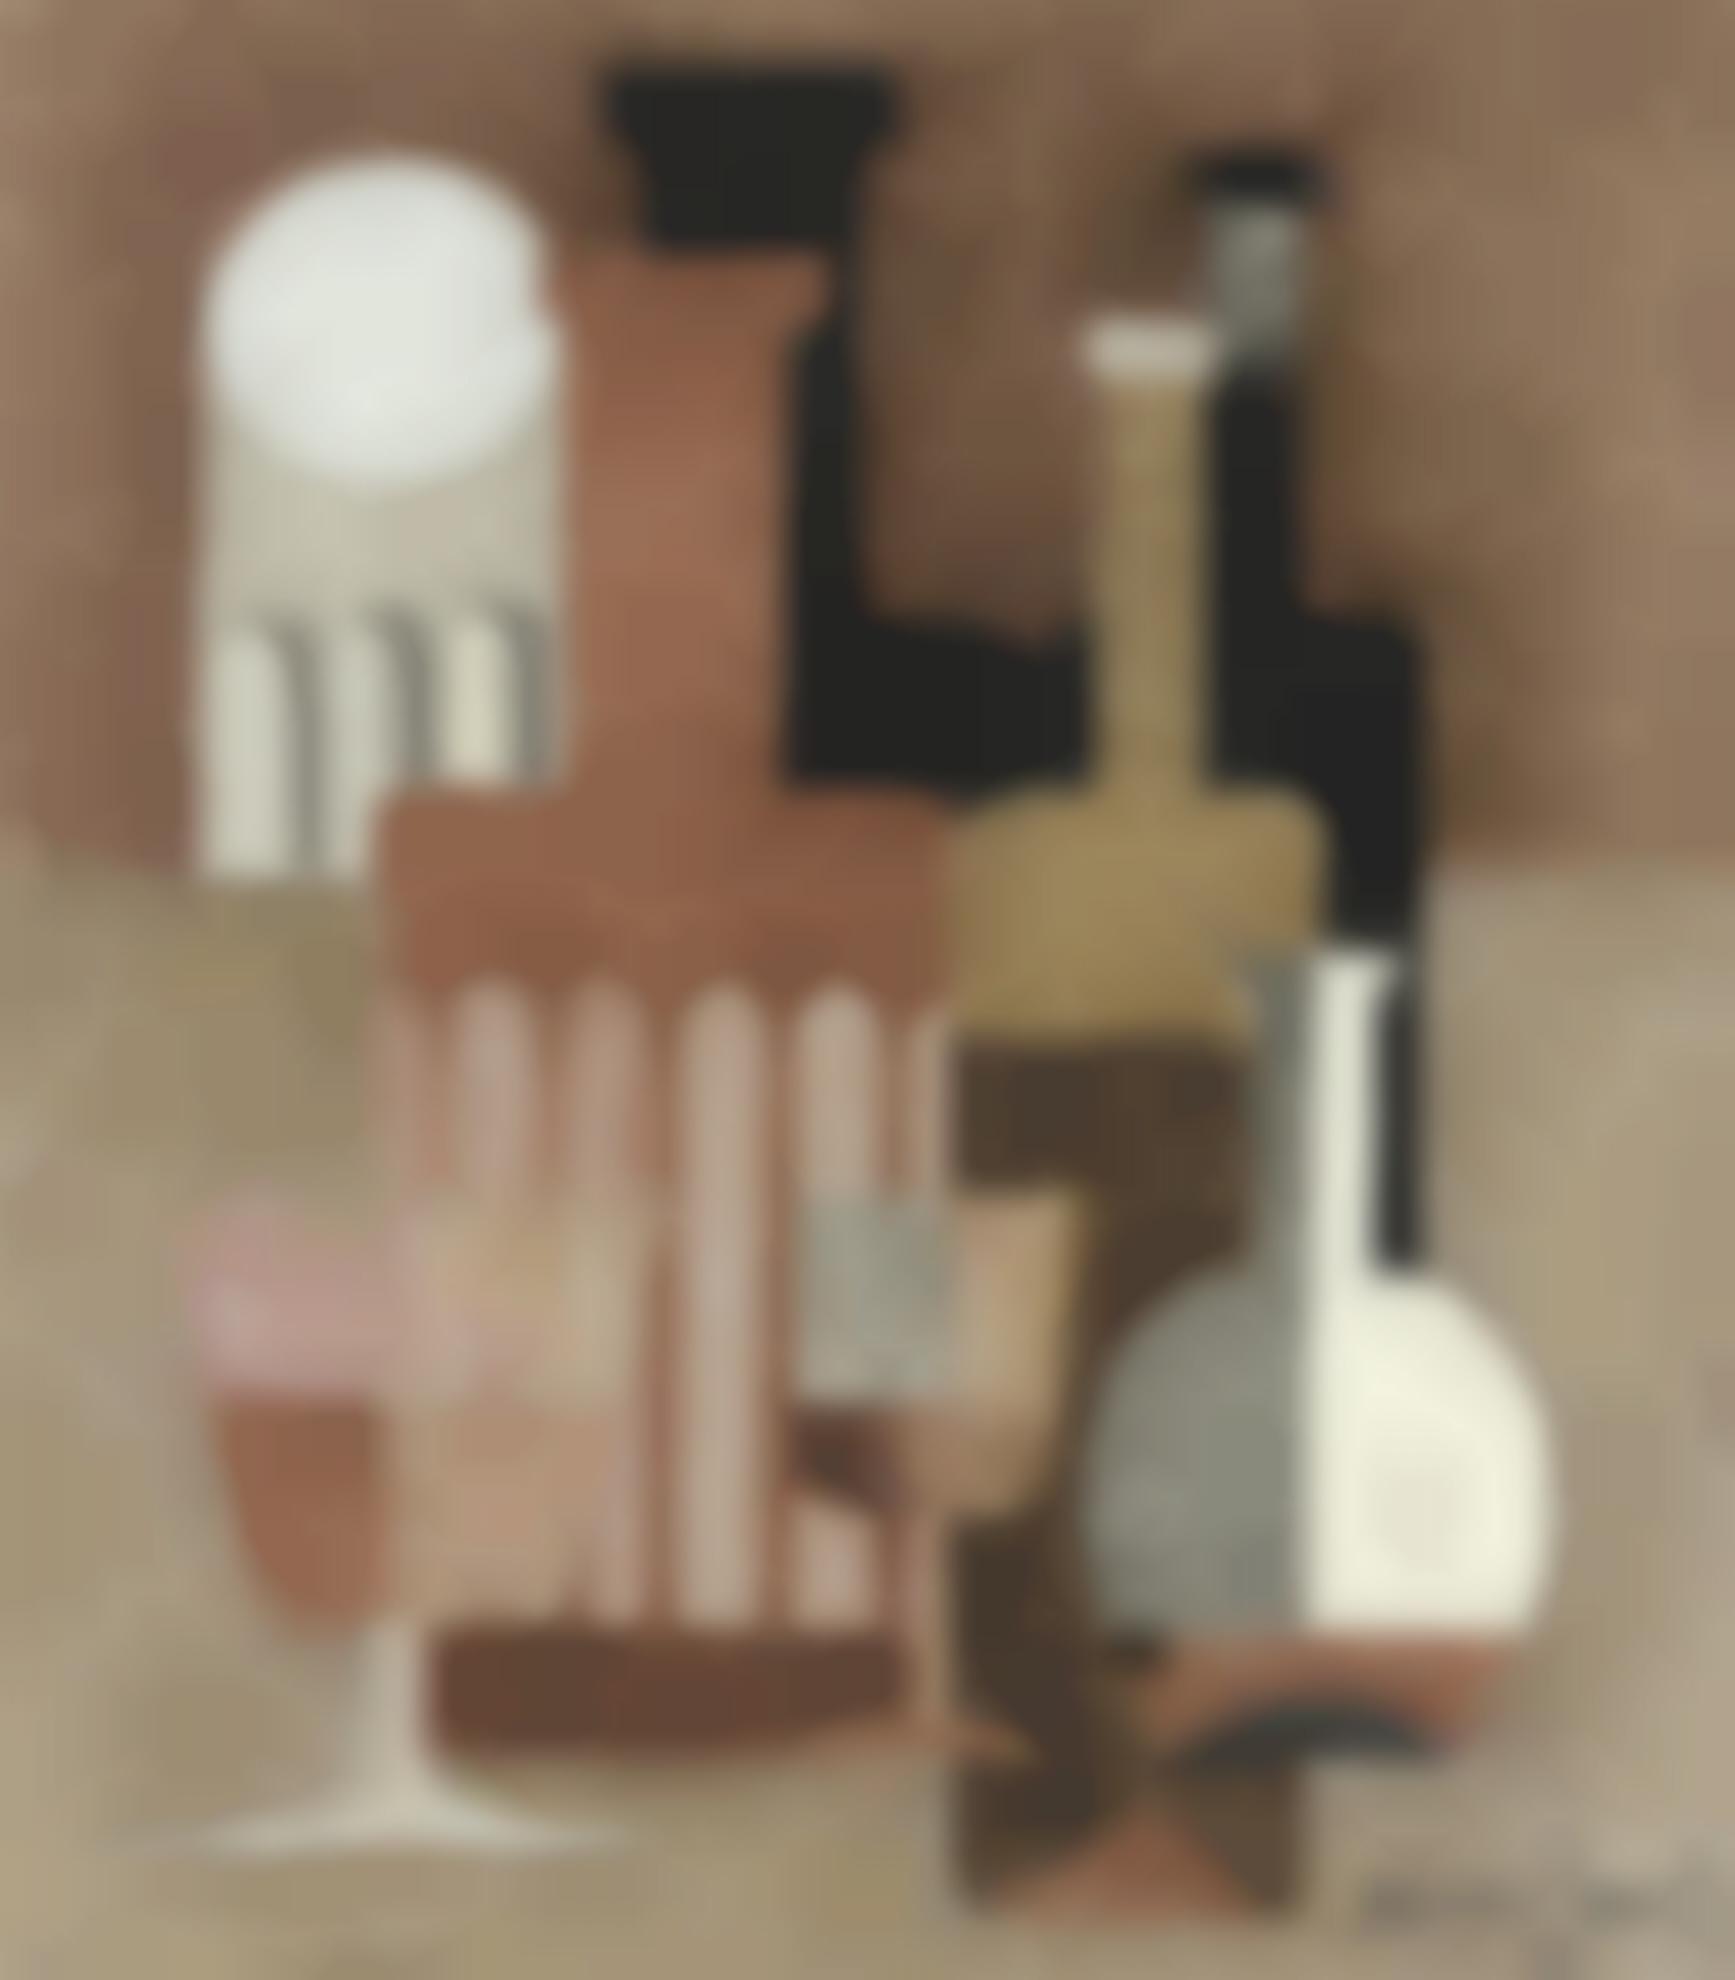 Amedee Ozenfant-Nature Morte Puriste-1922